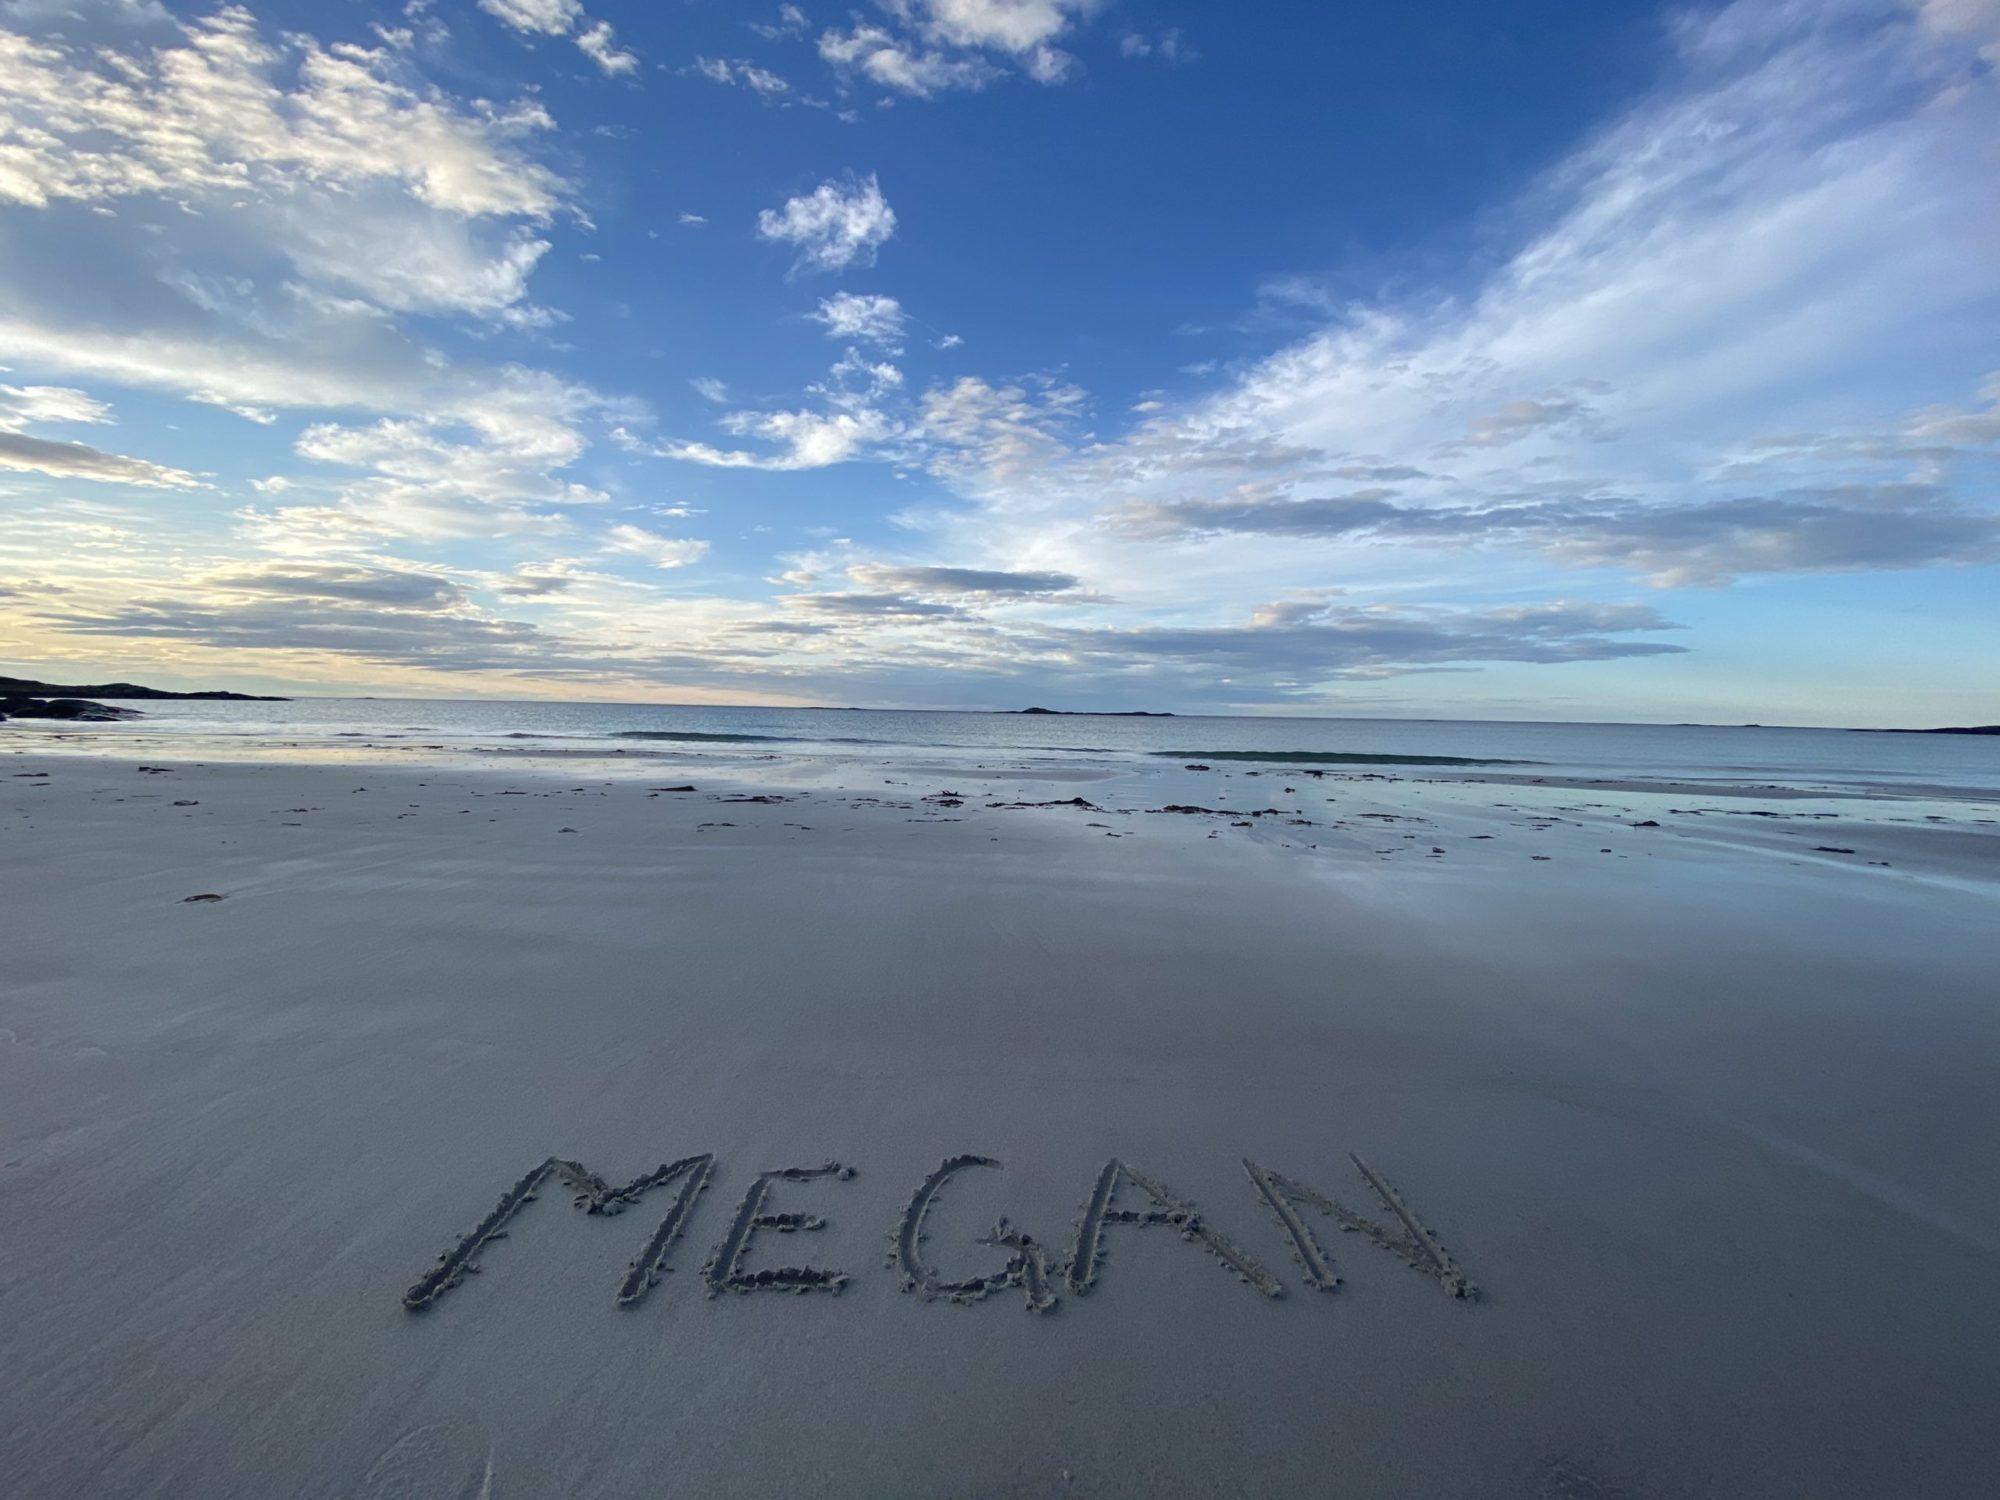 Megans arv